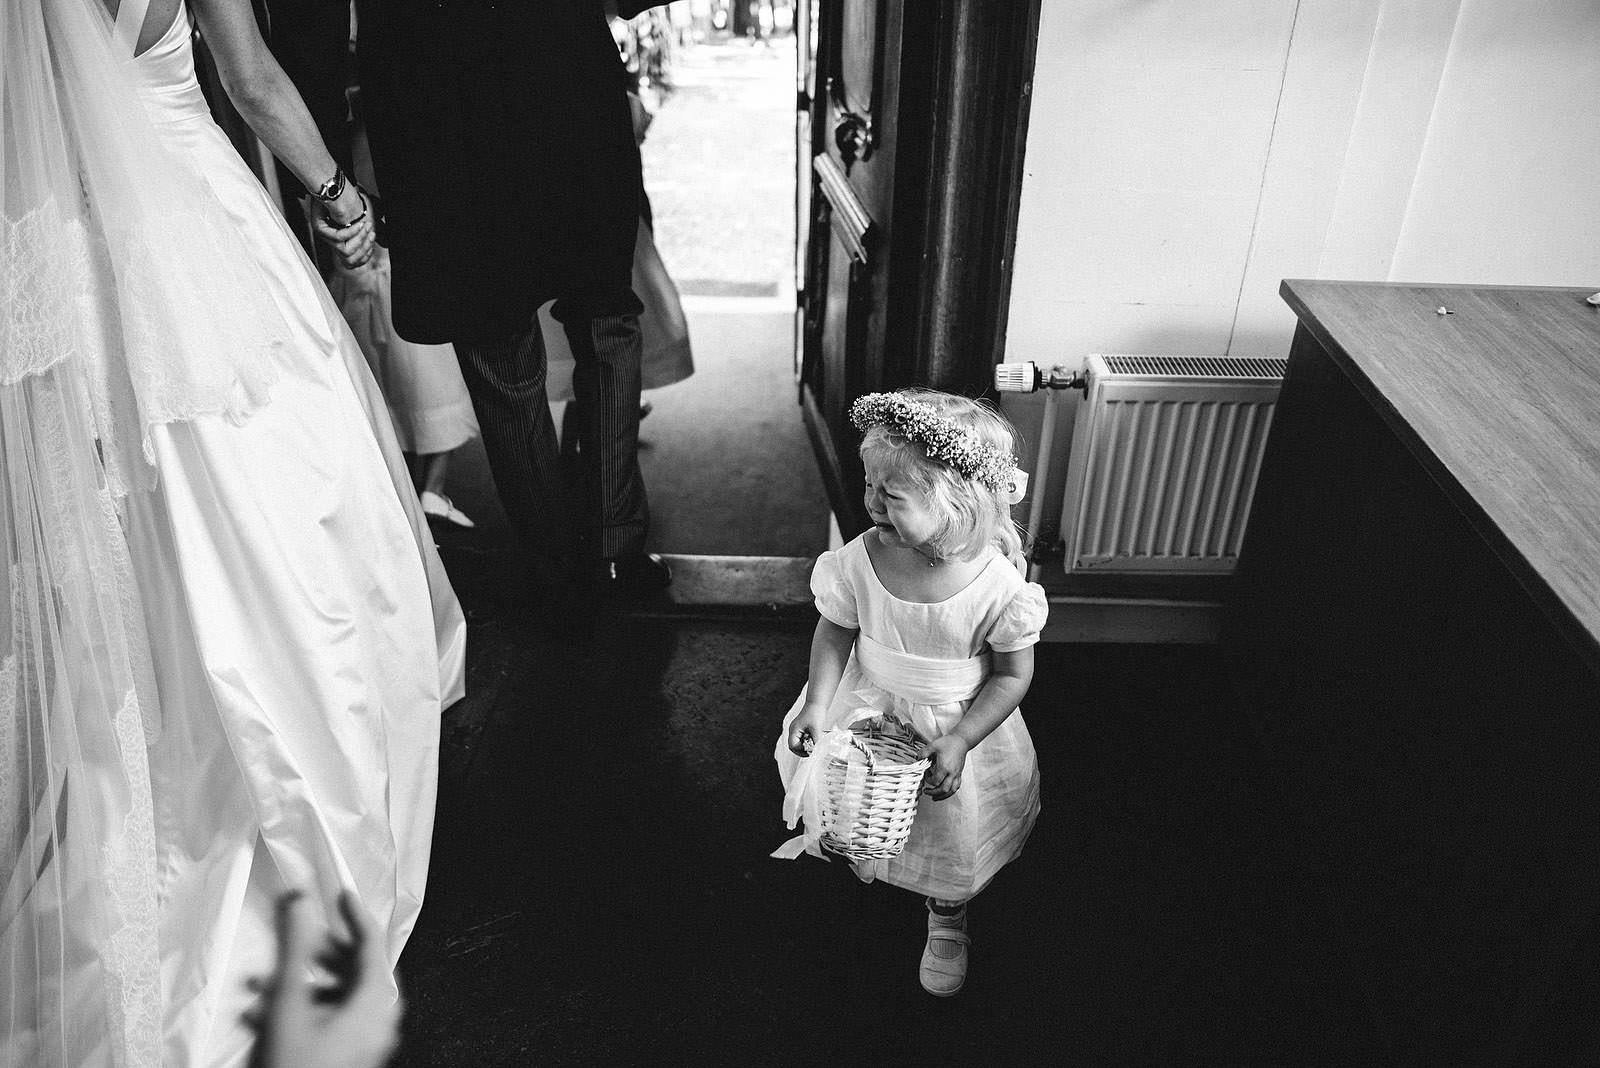 Fotograf Konstanz - Destination Wedding Photographer Amsterdam 042 - Destination Wedding Amsterdam  - 151 -